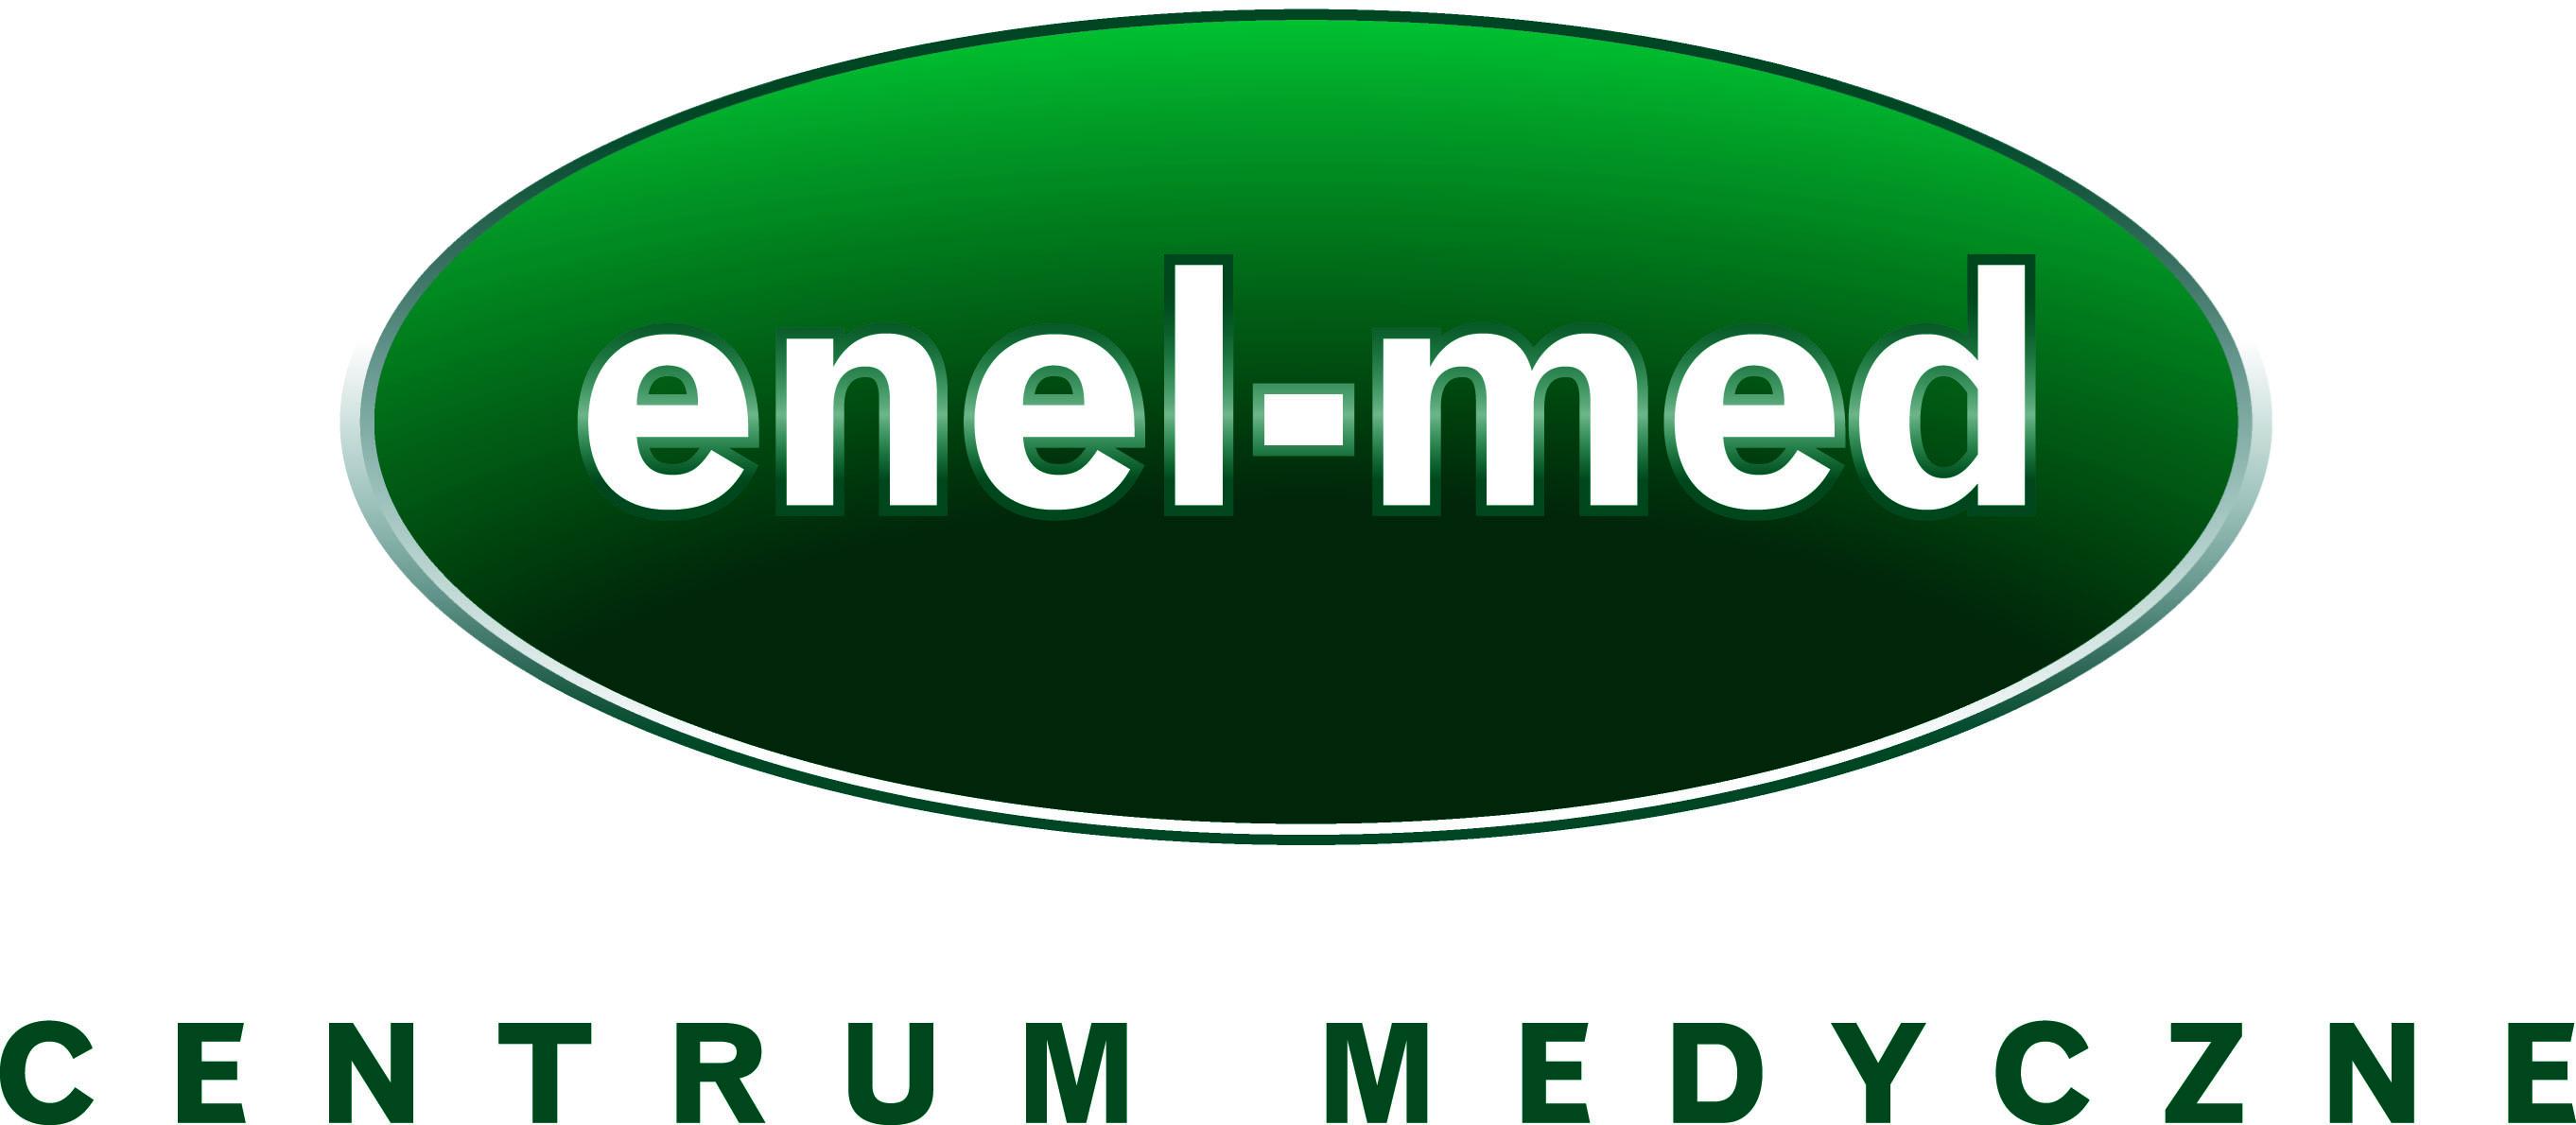 ENEL-MED logo